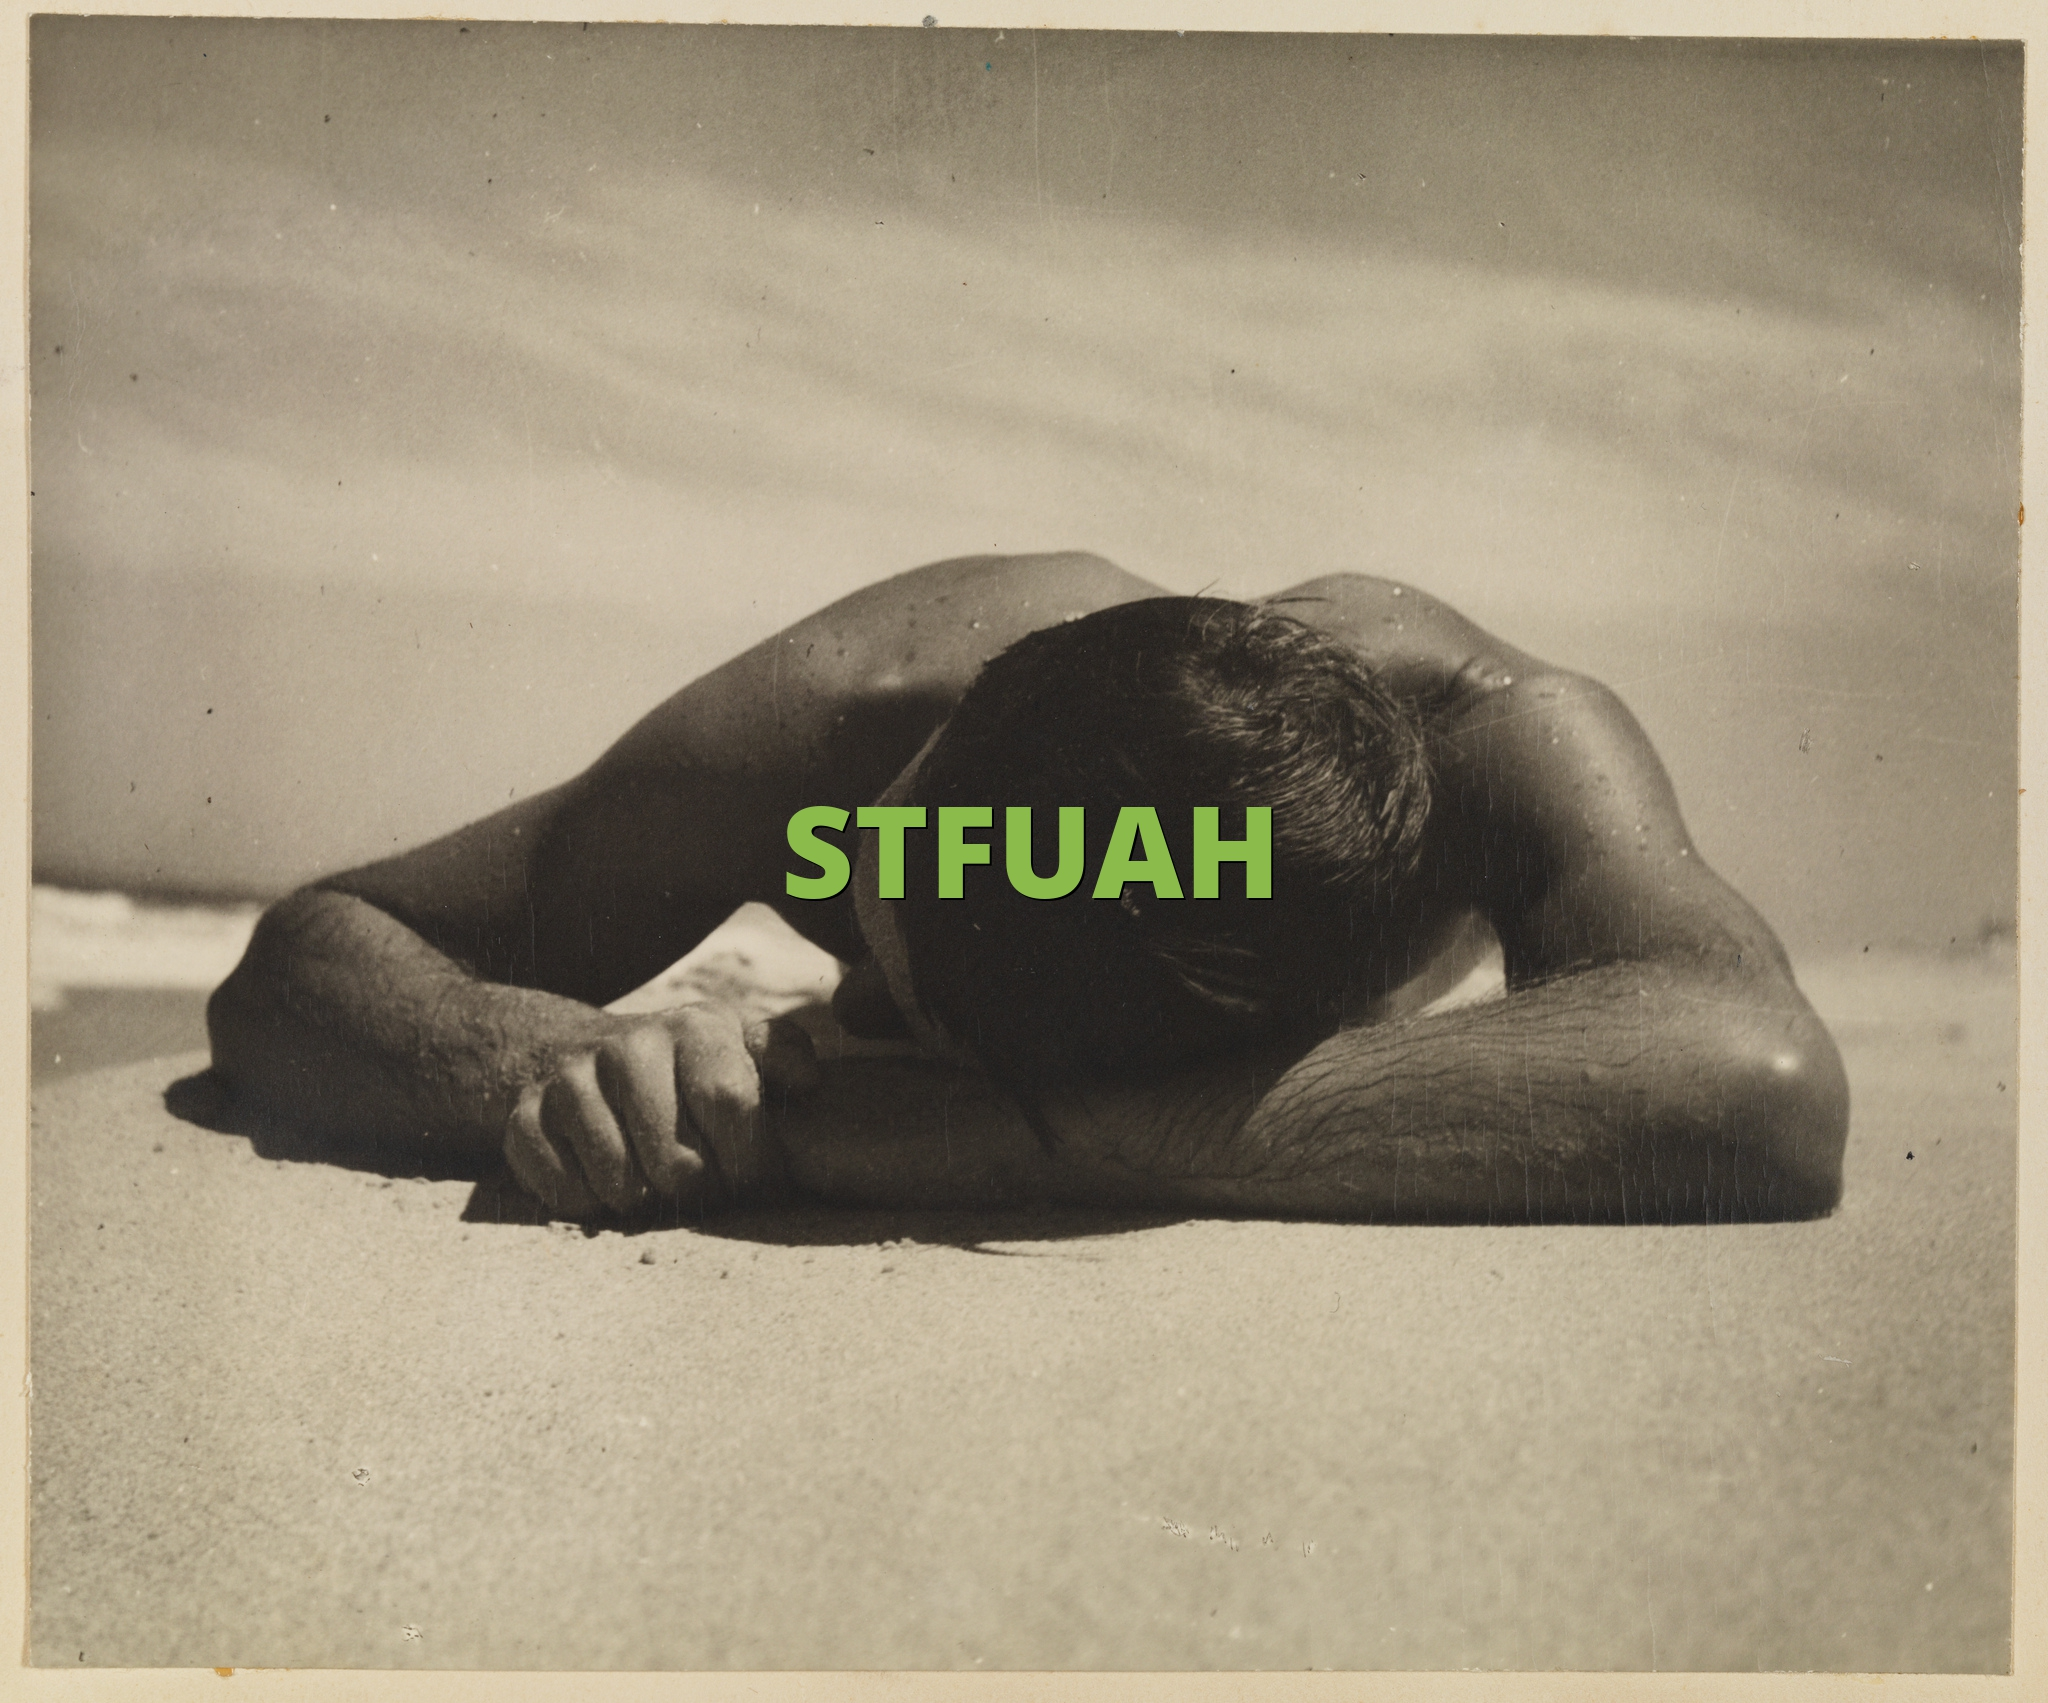 STFUAH